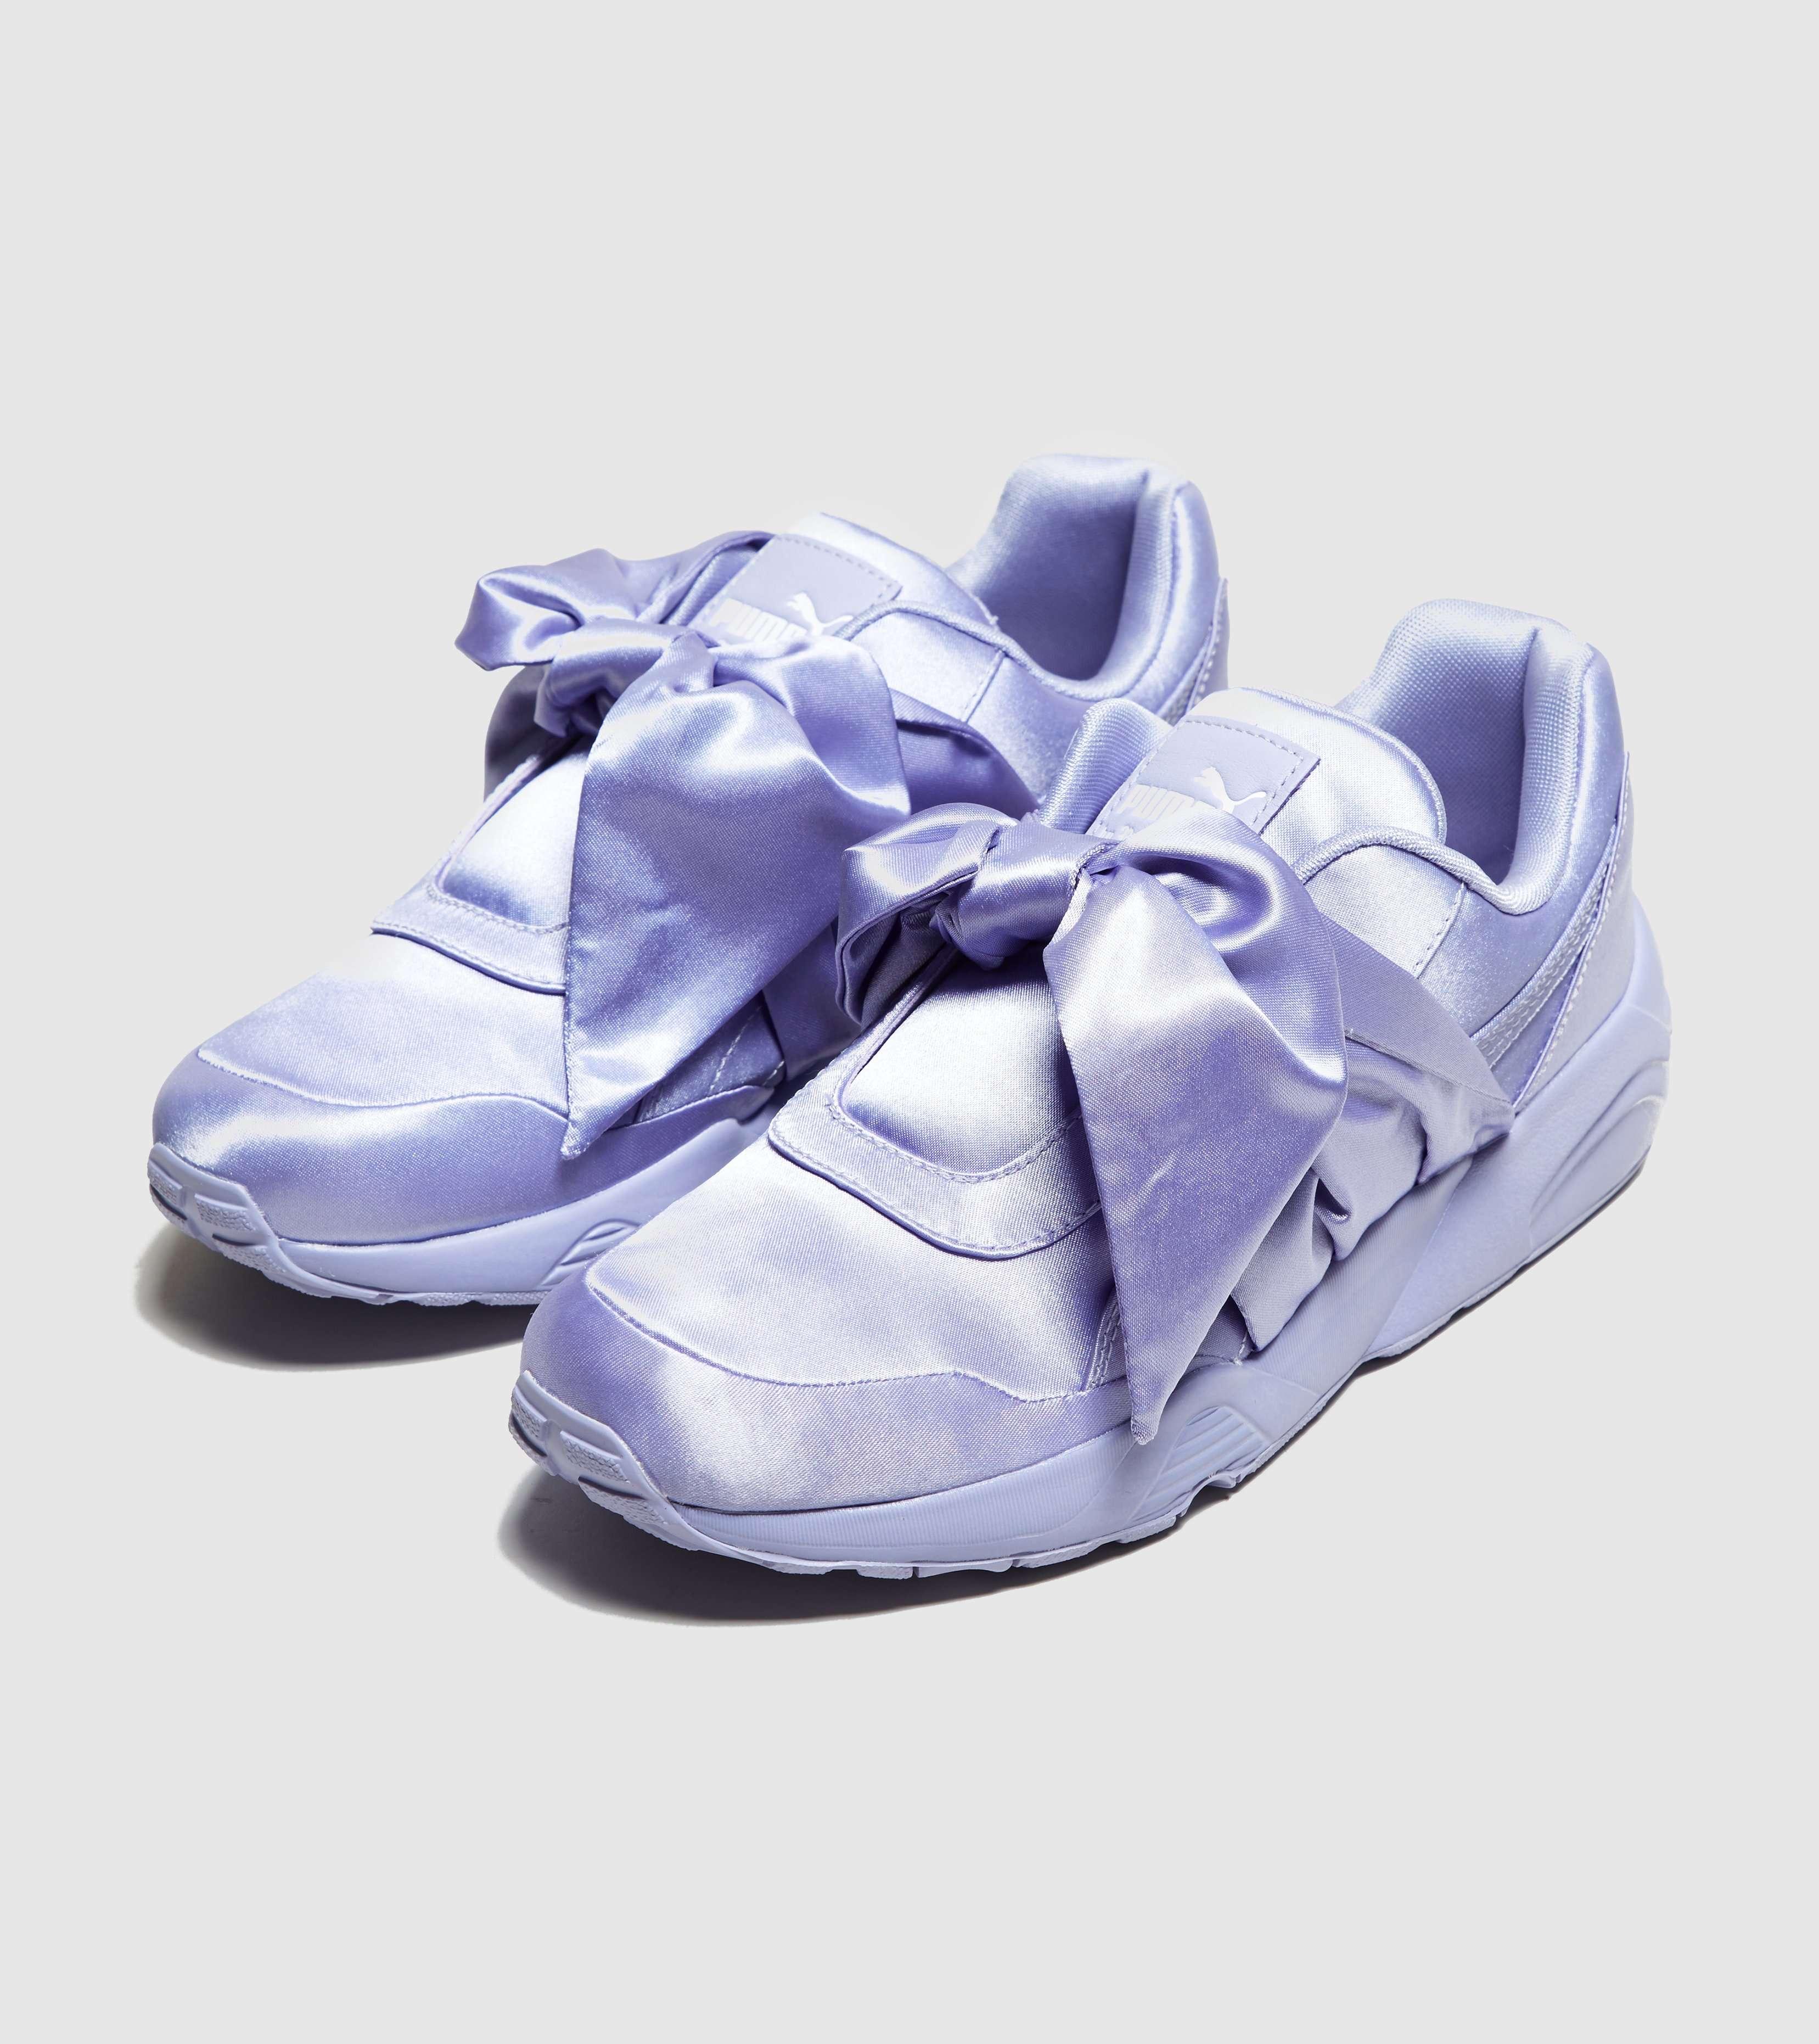 san francisco badd2 74e44 PUMA x Fenty Bow Sneakers | Size?